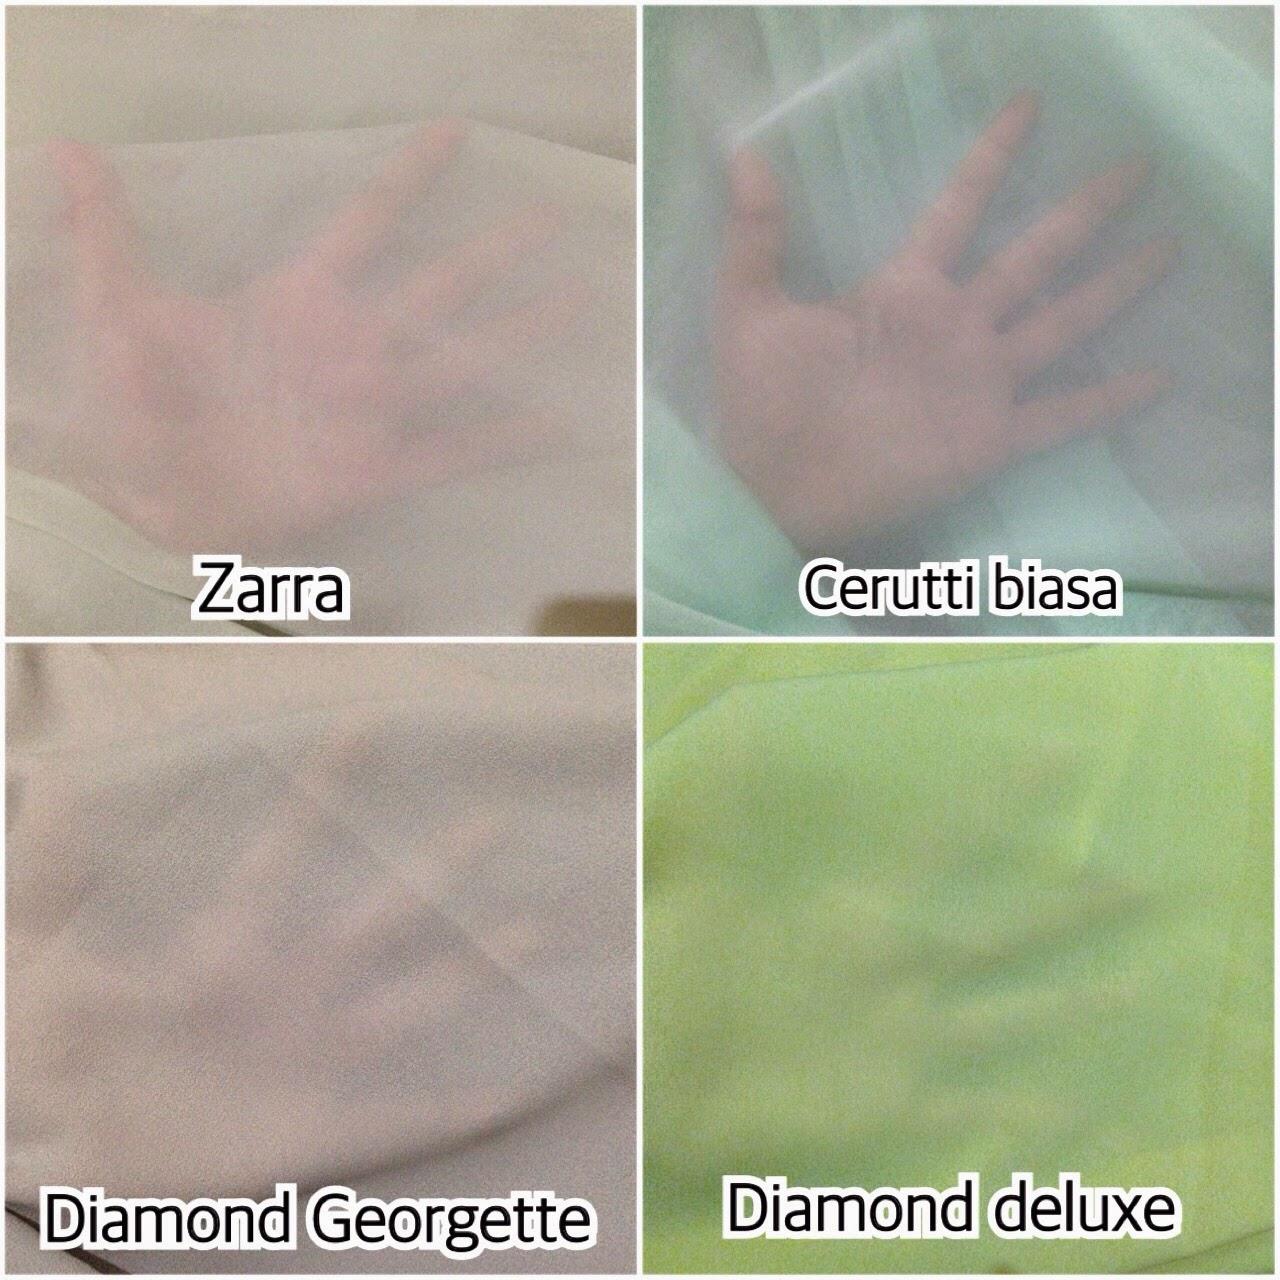 Chiffon Cerutti Biasa Vs Zarra Vs Diamond Georgette Vs Diamond